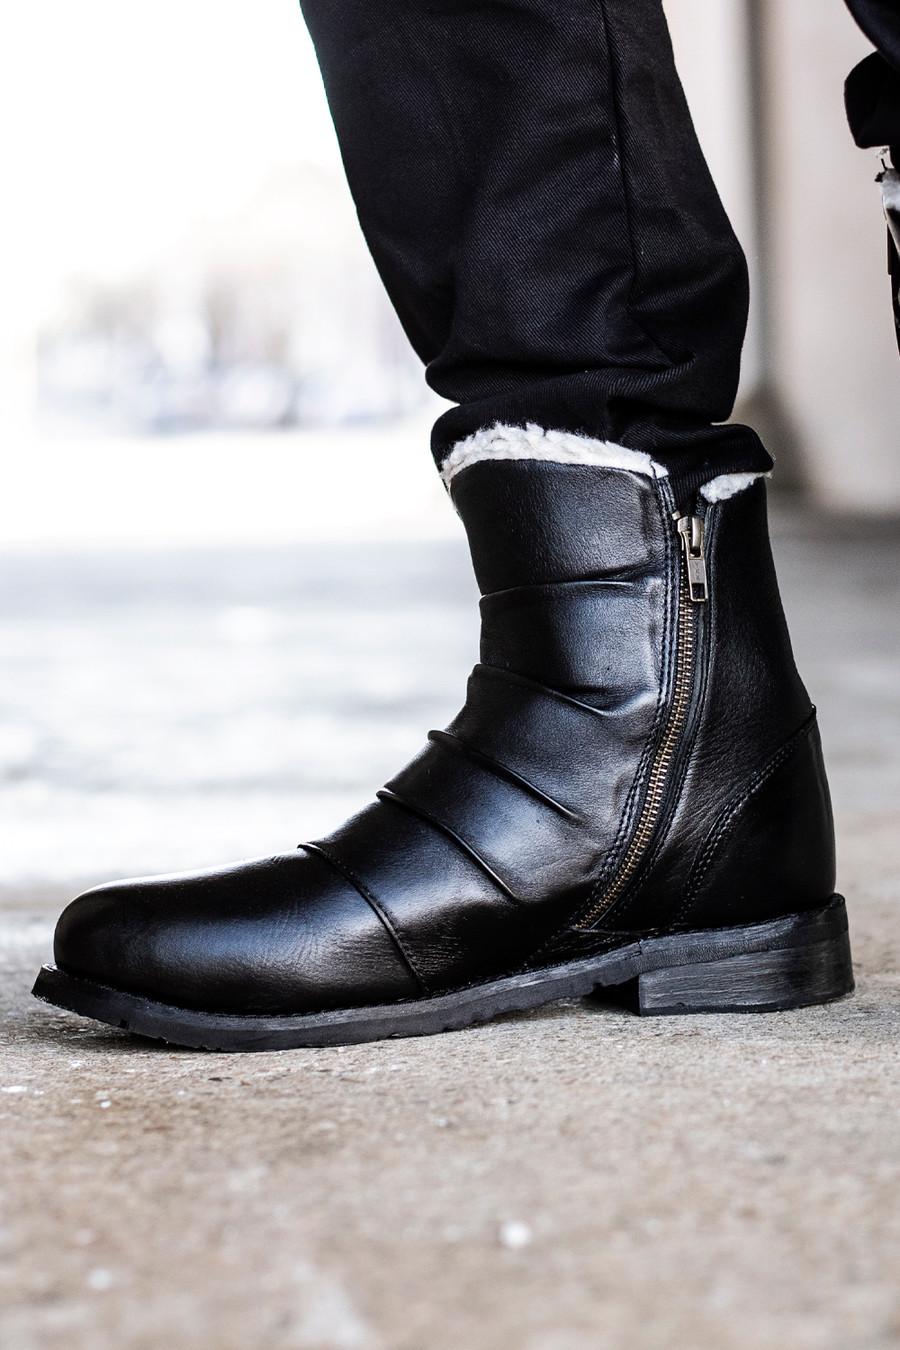 Valiant Aviator Boots